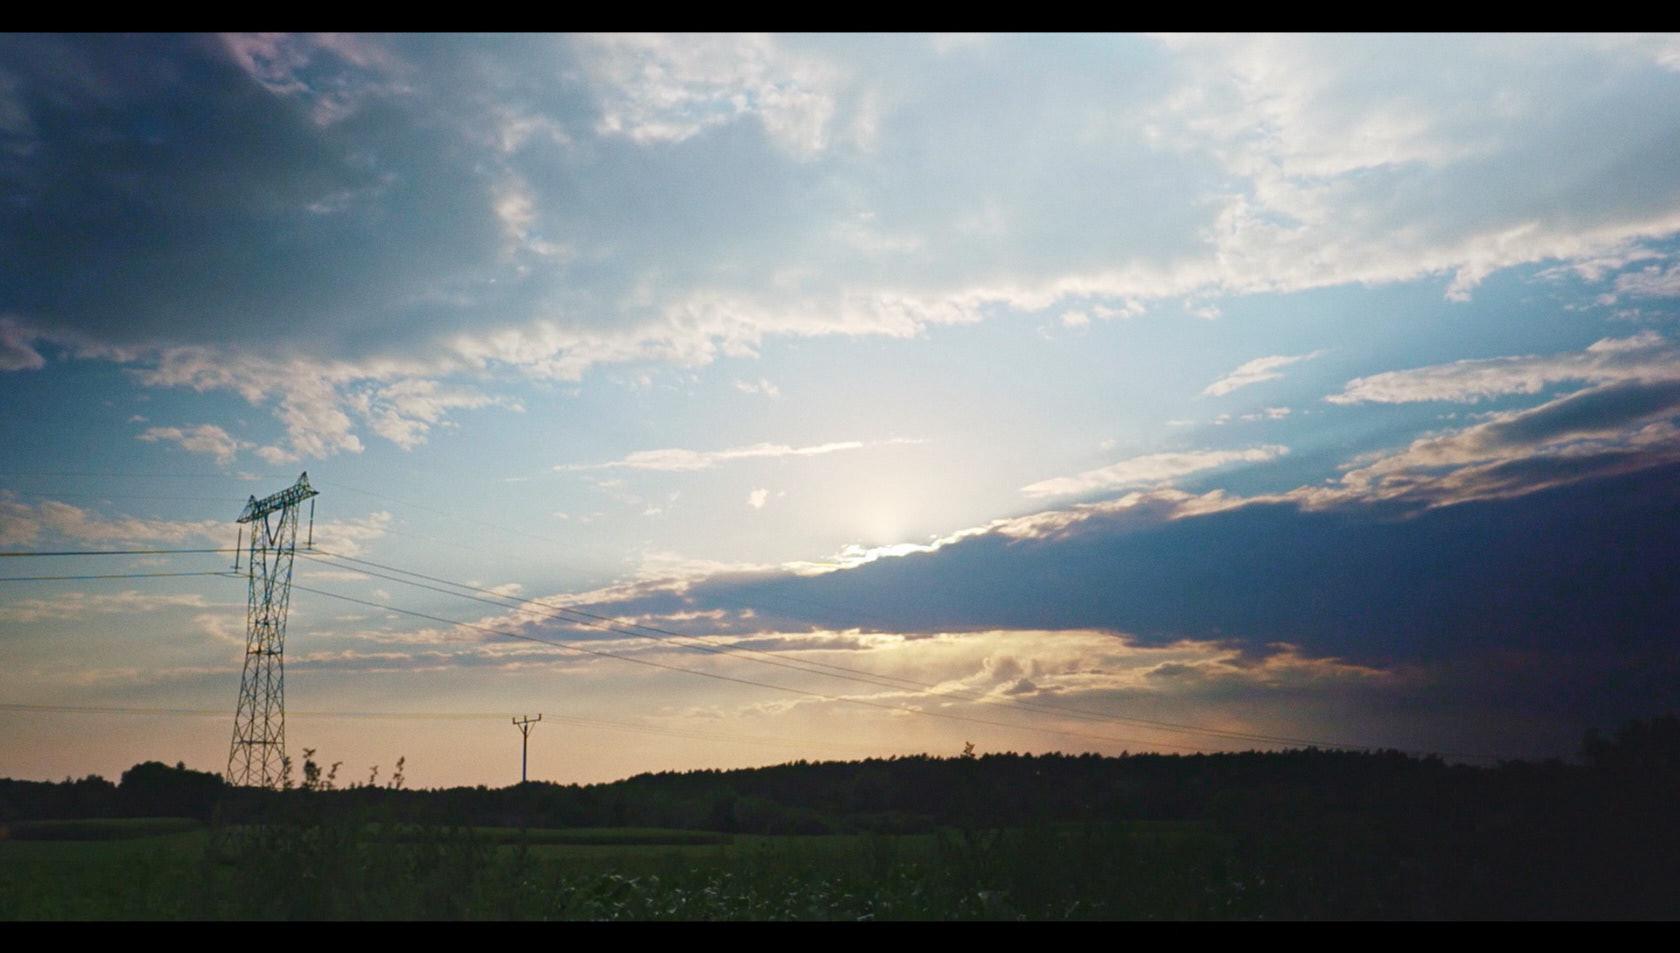 _À NOUS D'AGIR_sg_28.jpg